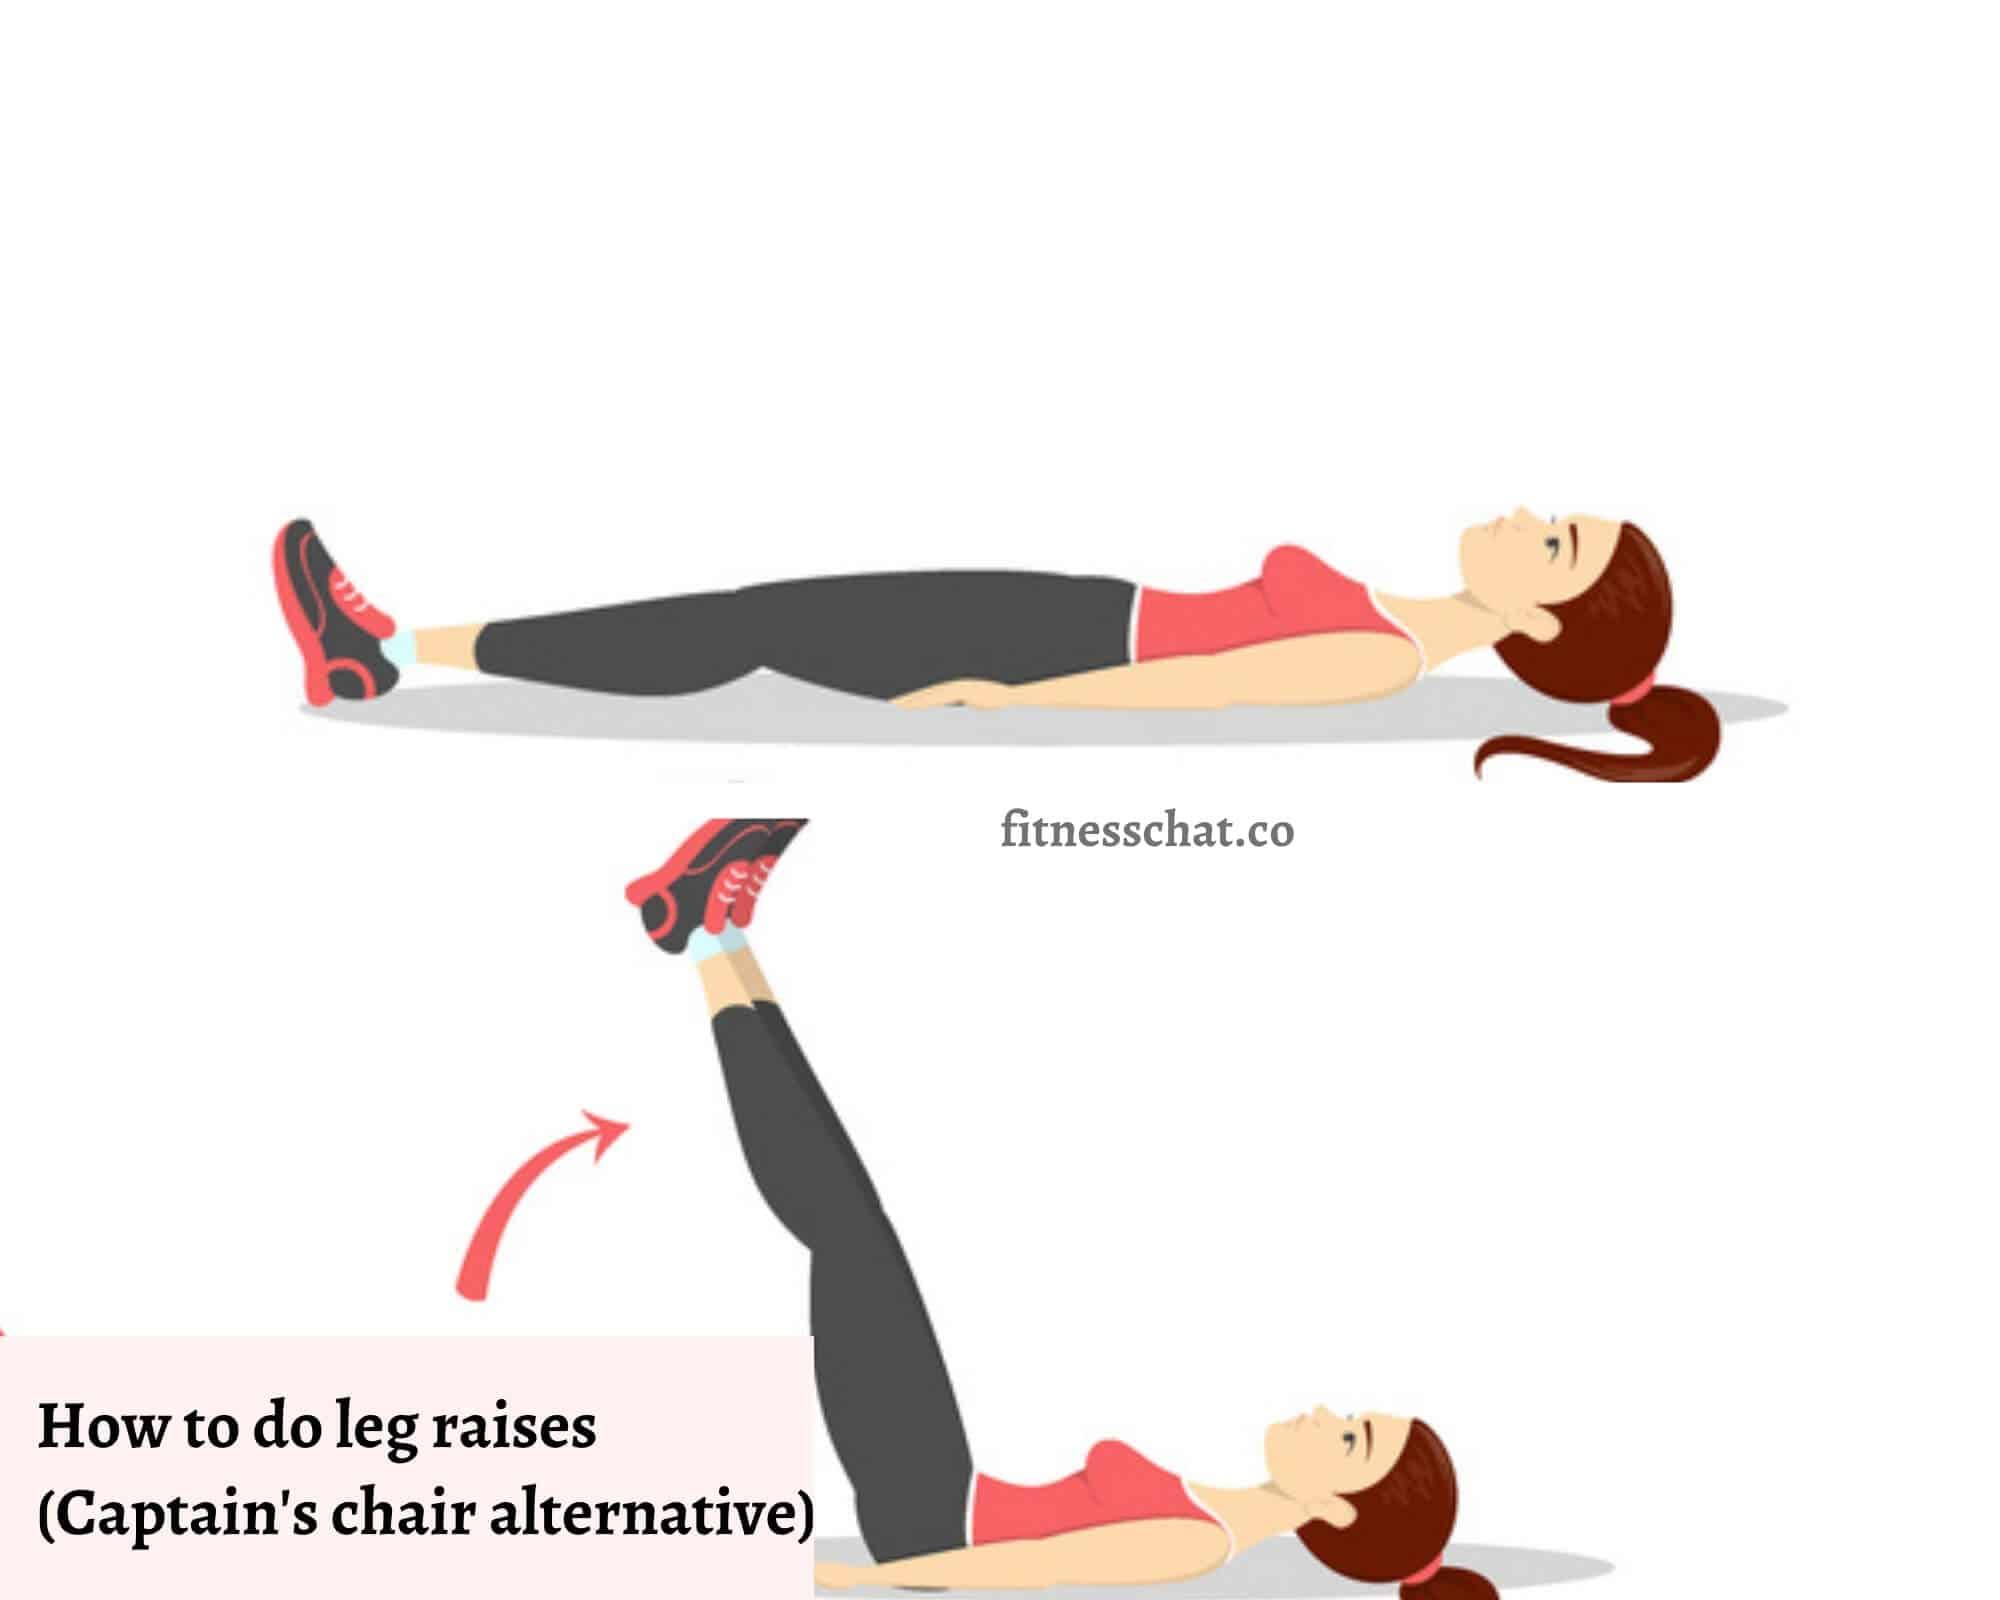 How to do leg raises (Captain's chair alternative at home)